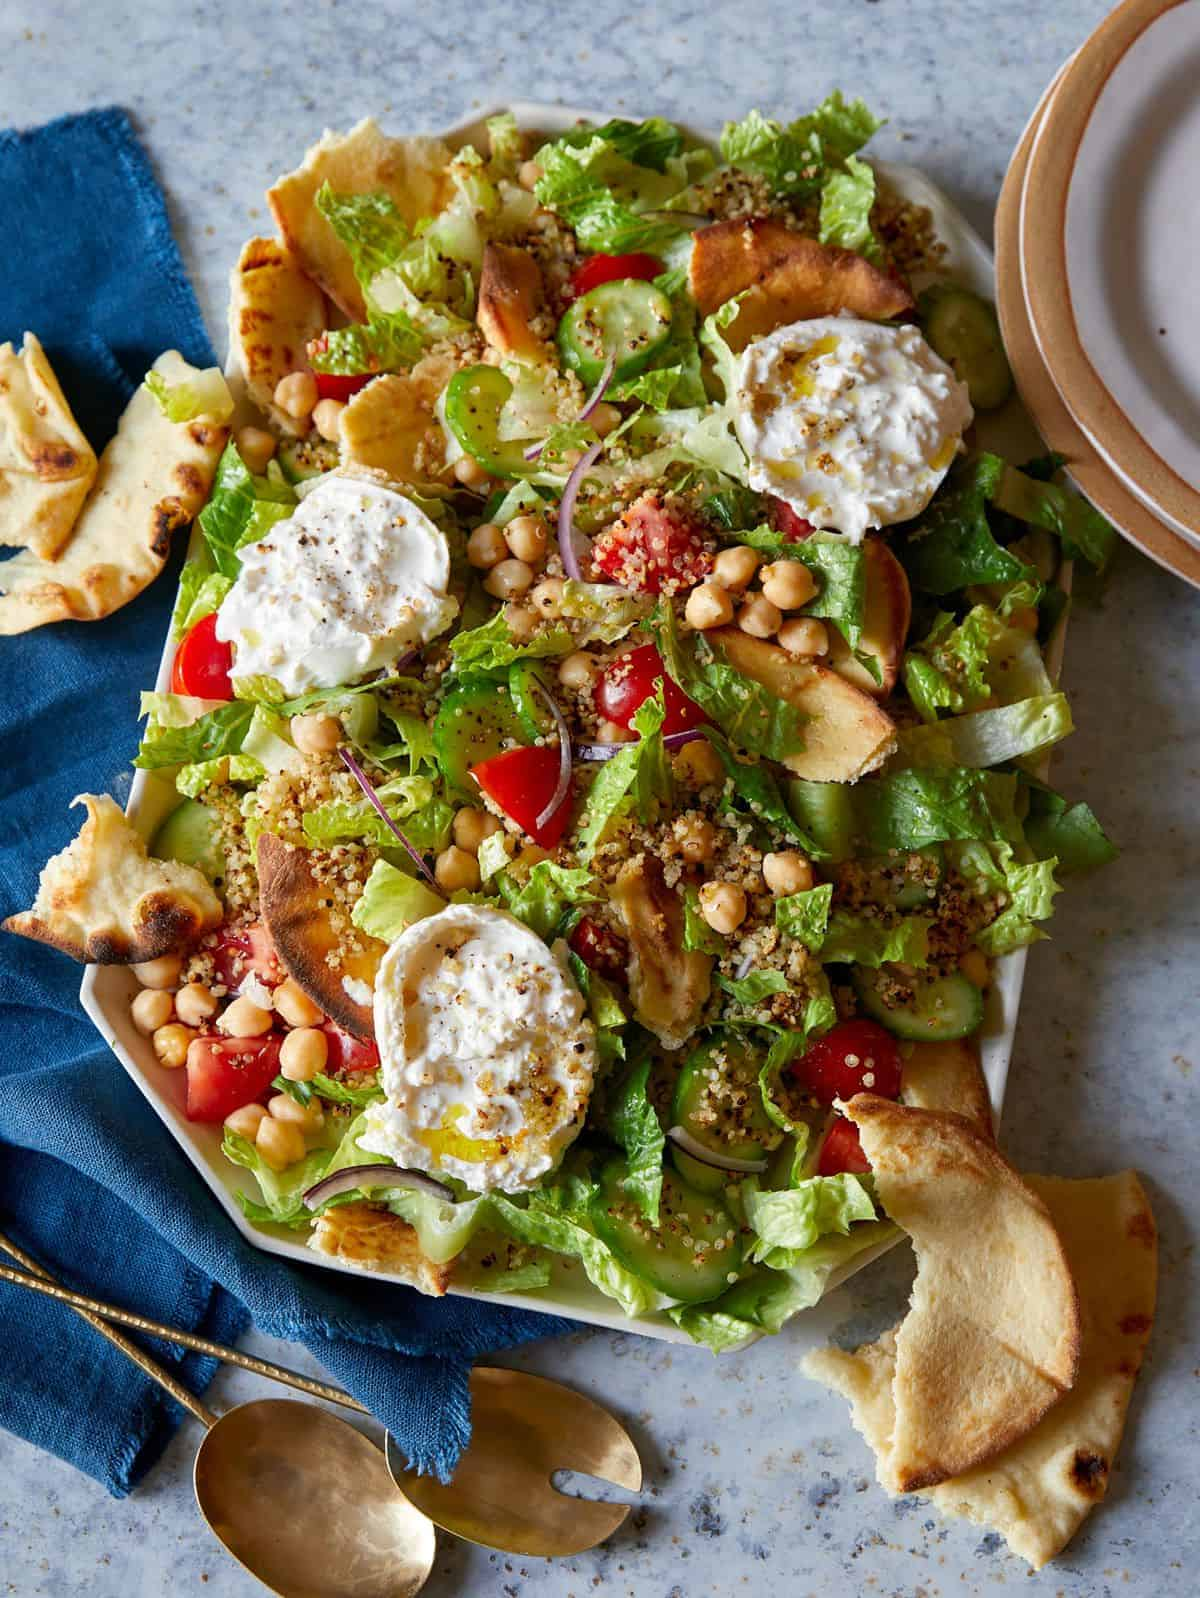 Fattoush style salad with crispy quinoa on a platter.